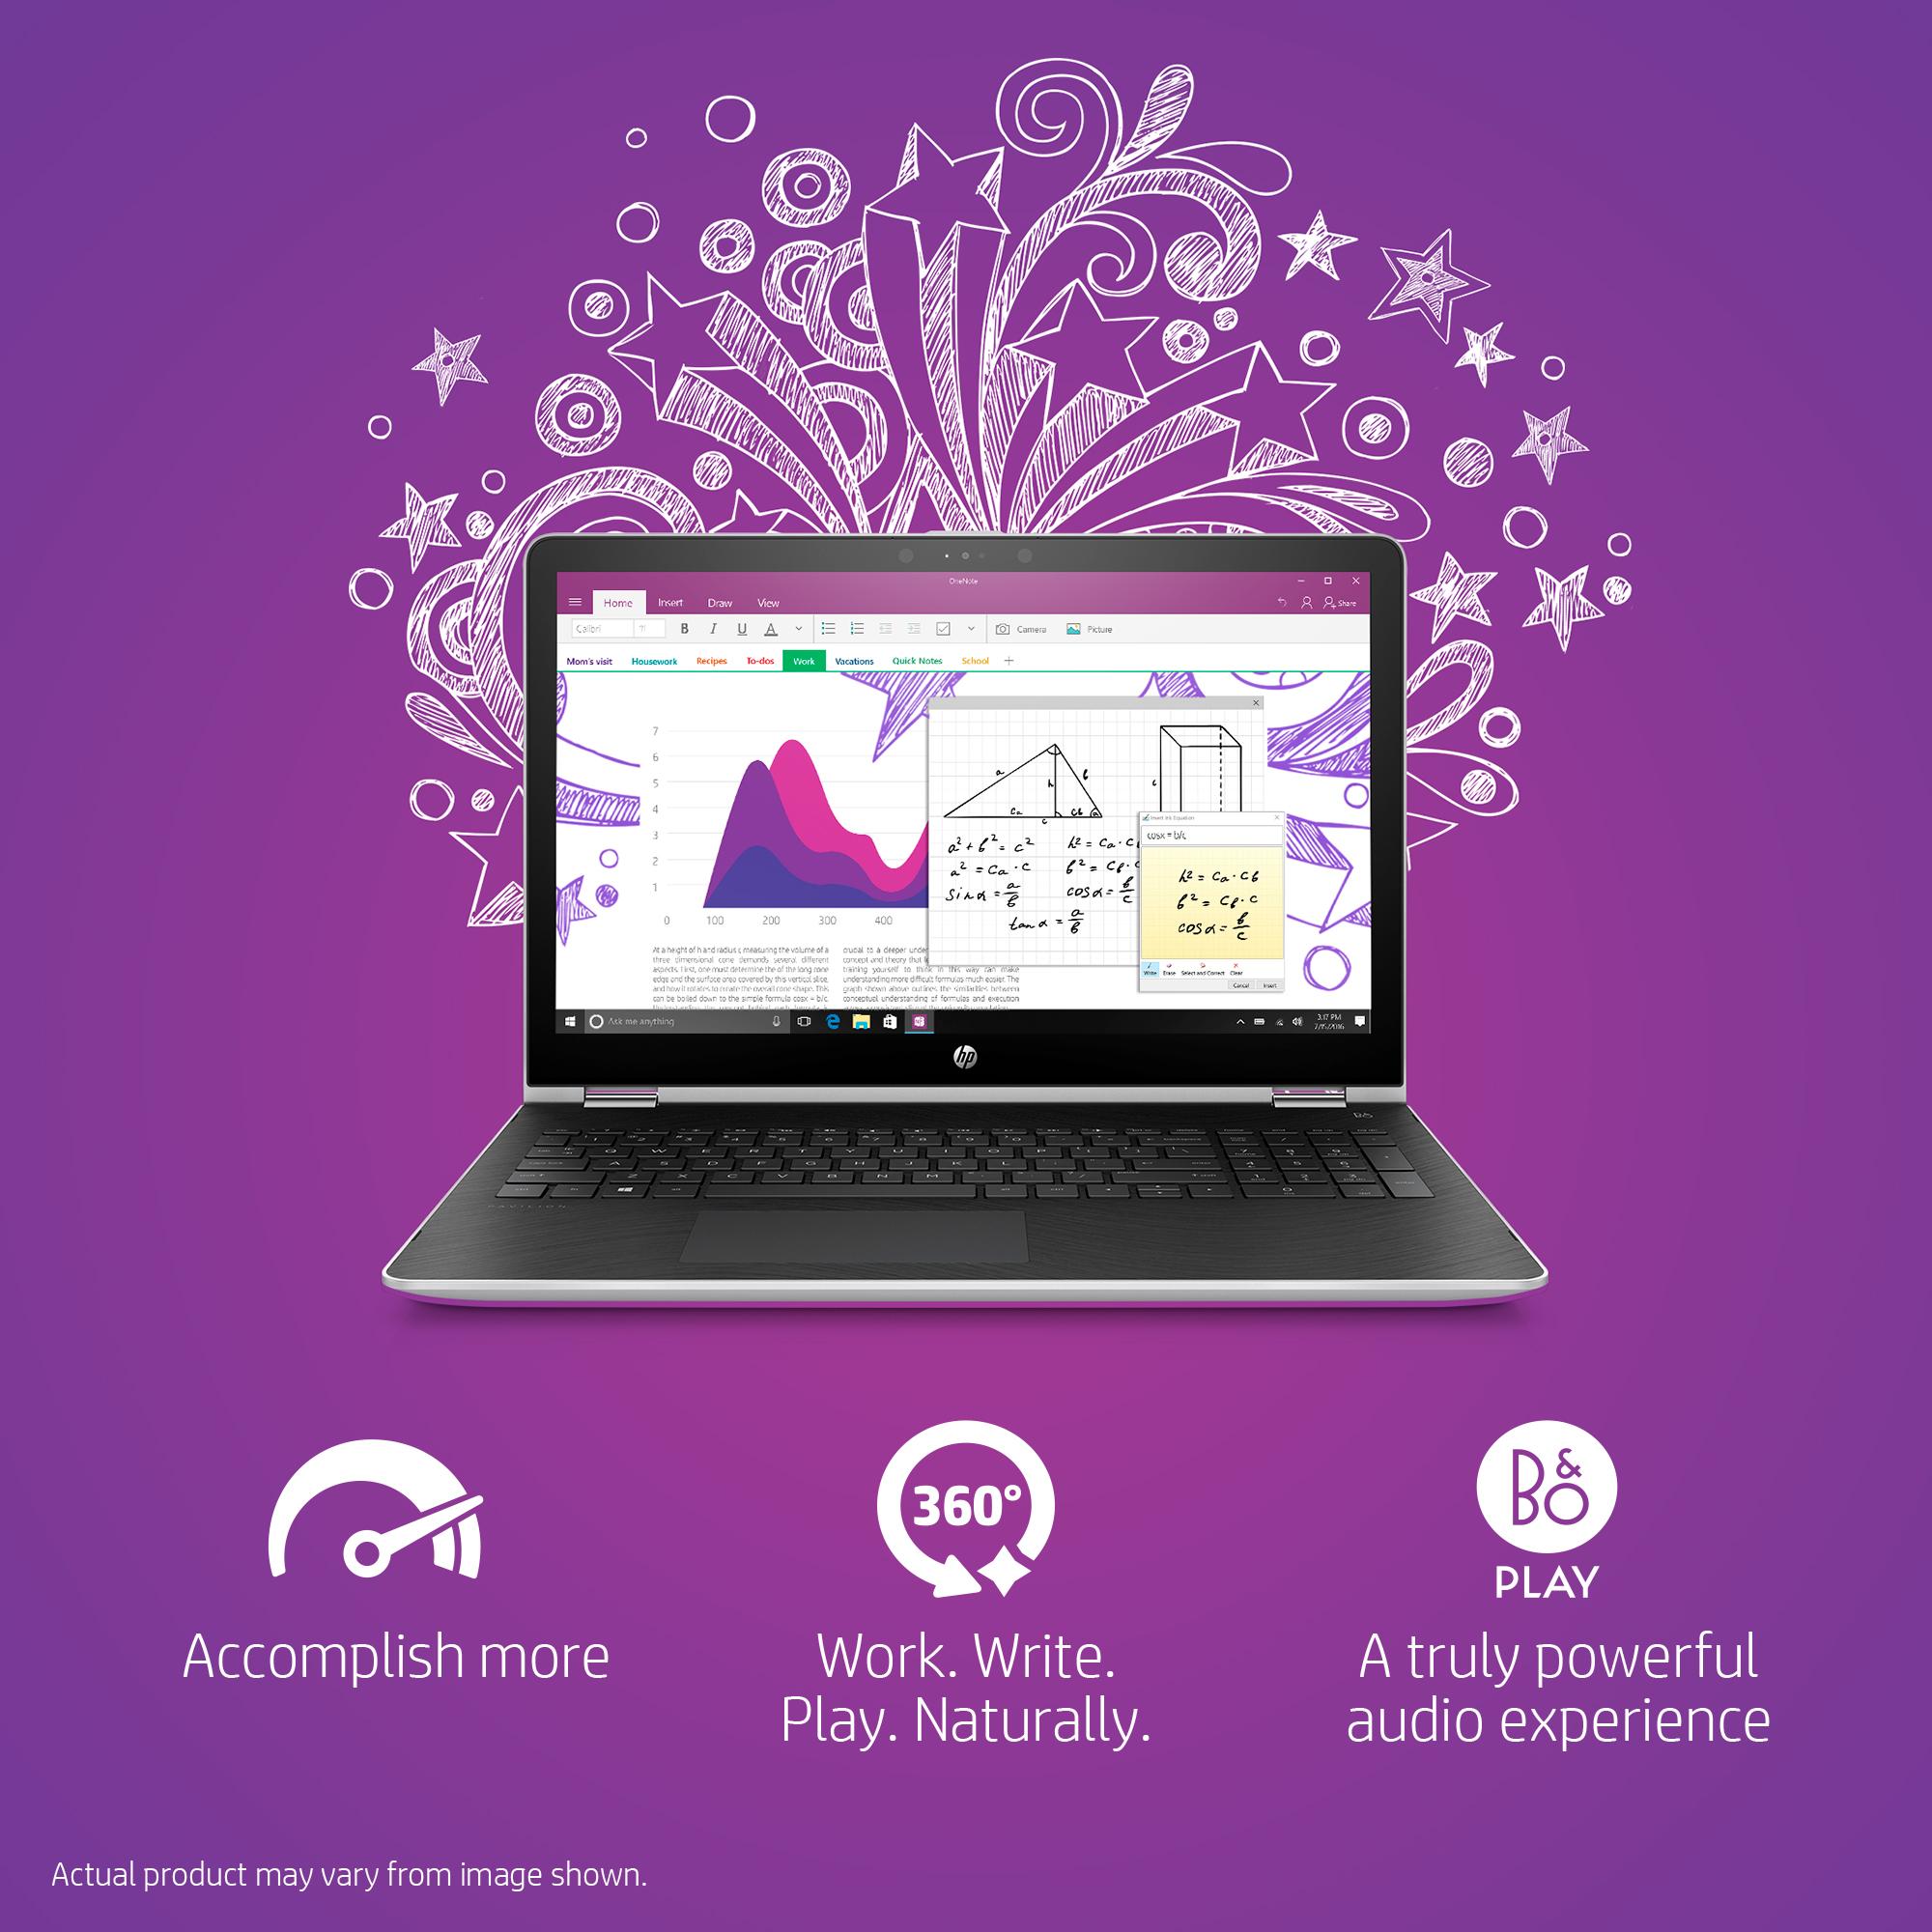 HP Pavilion x360 Convertible Laptop 15 6 Touch Screen Intel Core i5